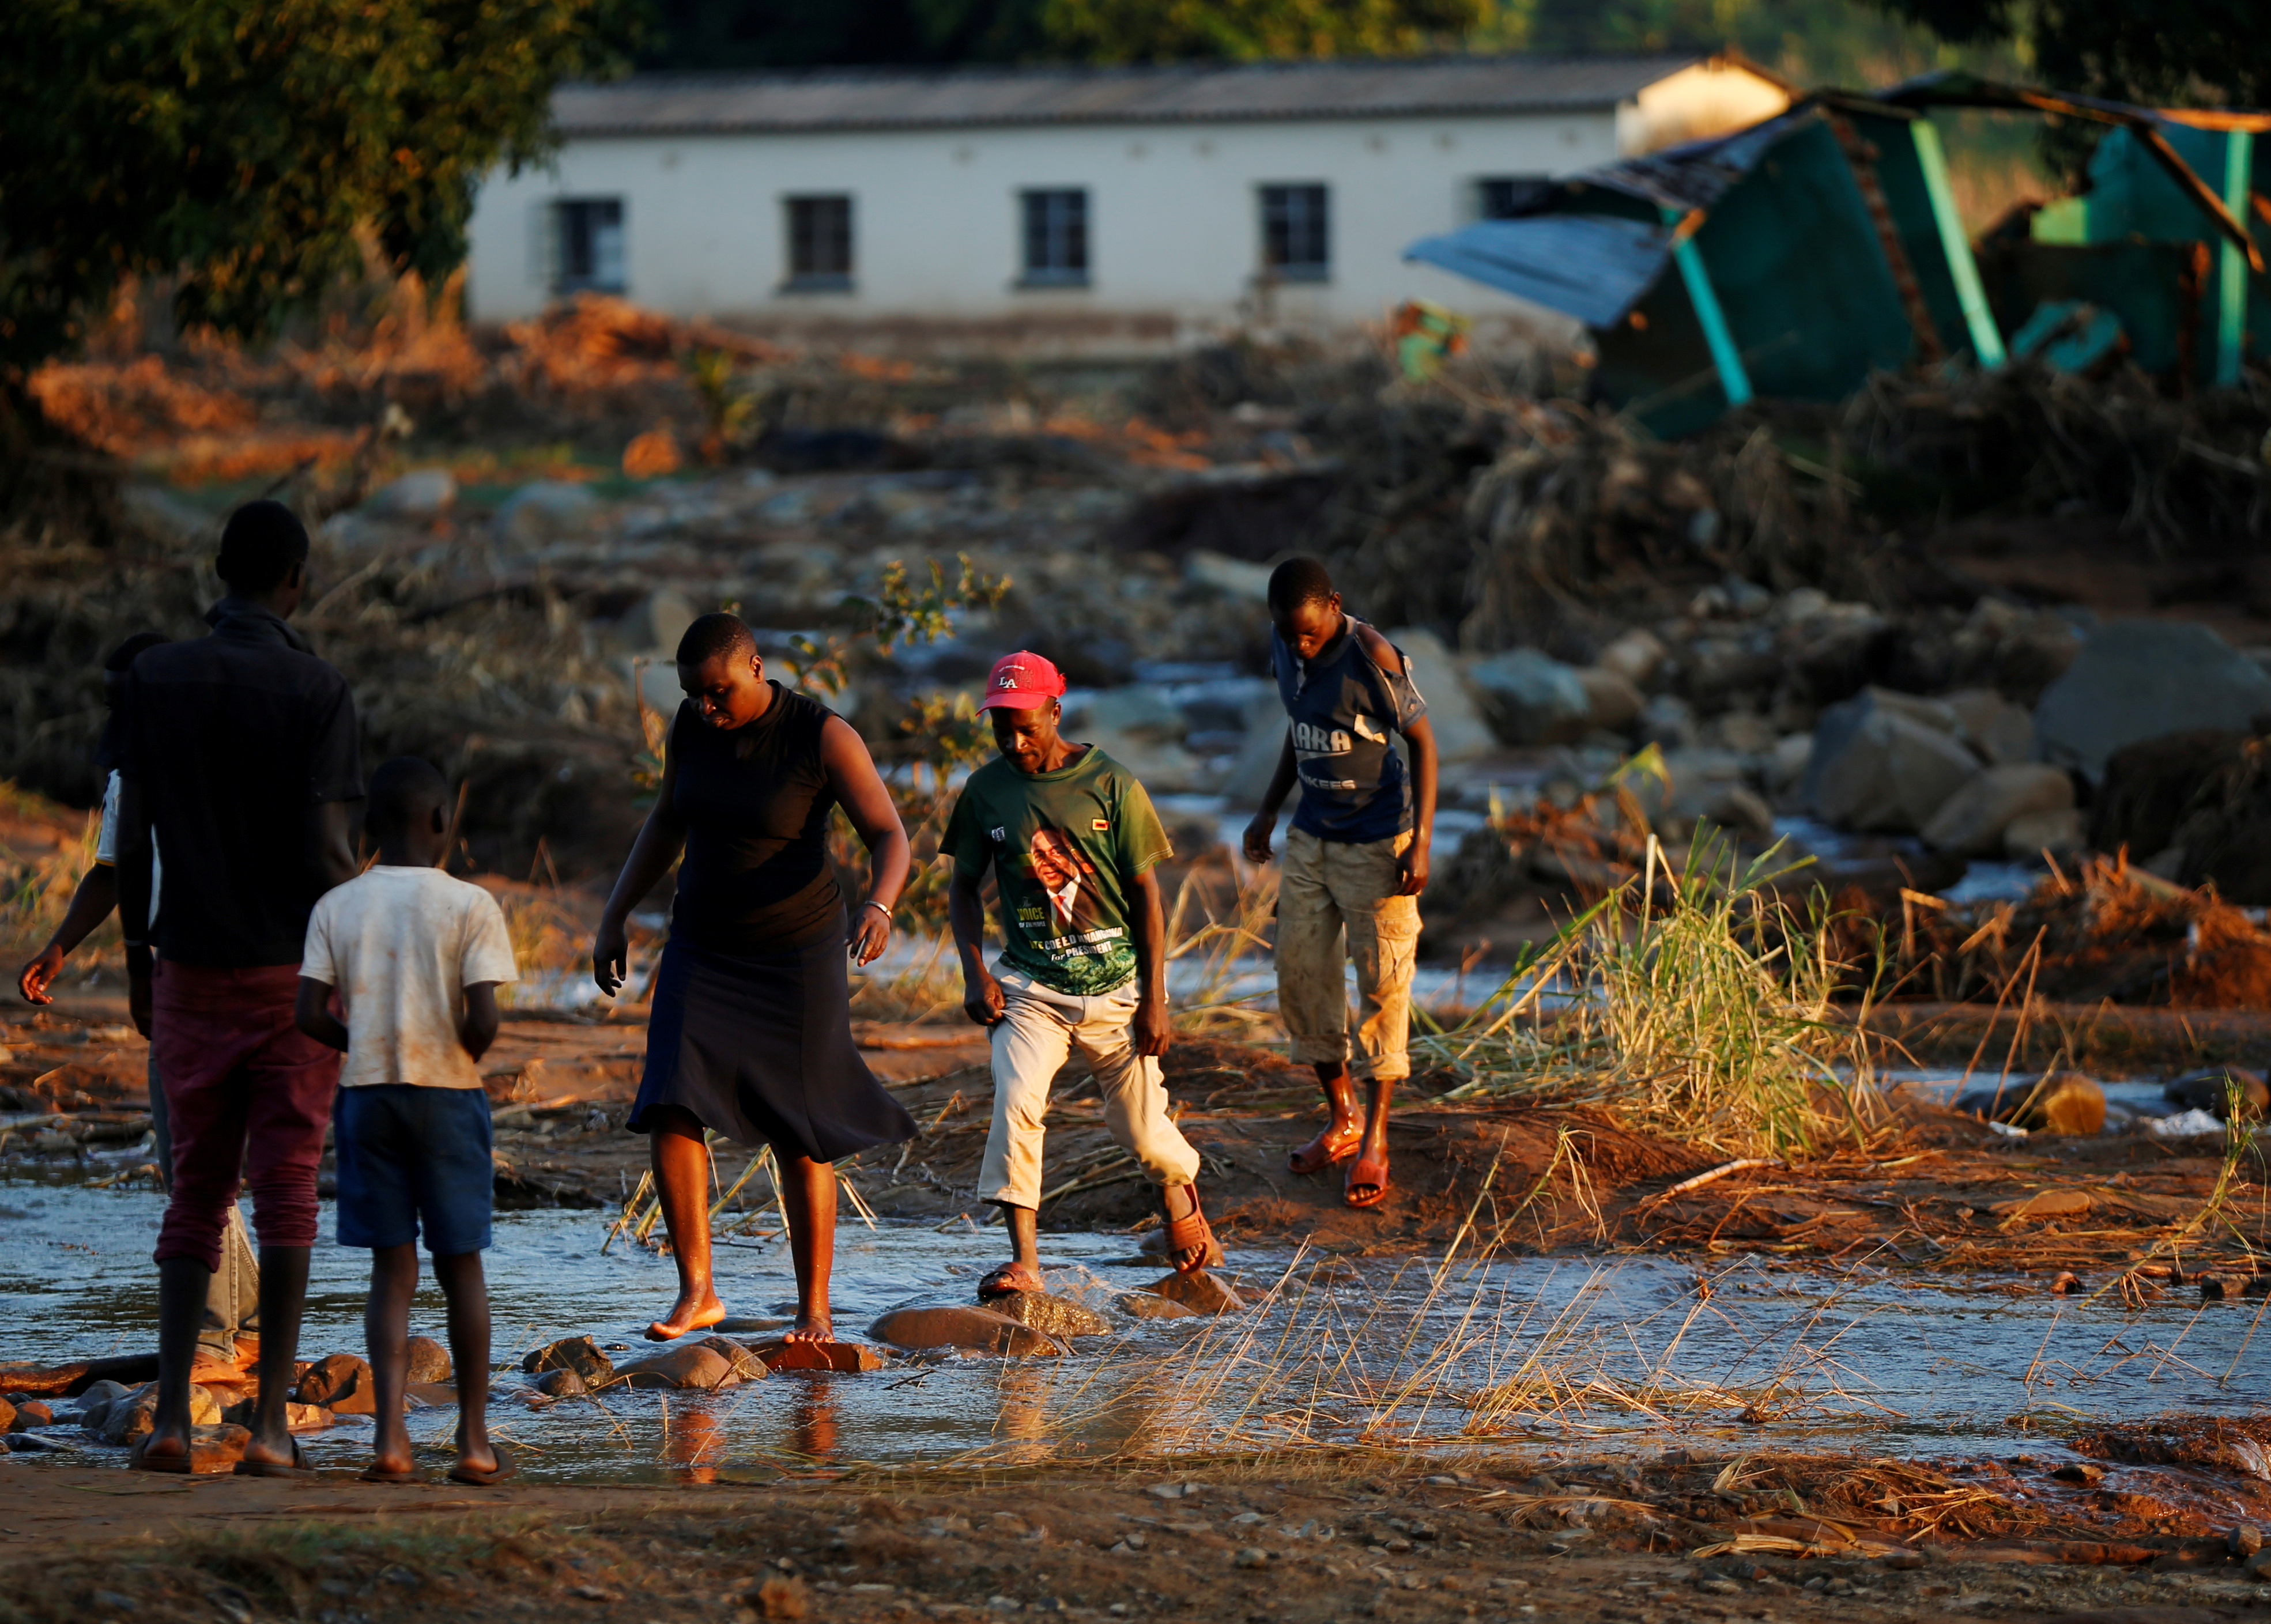 Survivors ofCycloneIdaiwalk through flooded waters to business centerto receive aid.